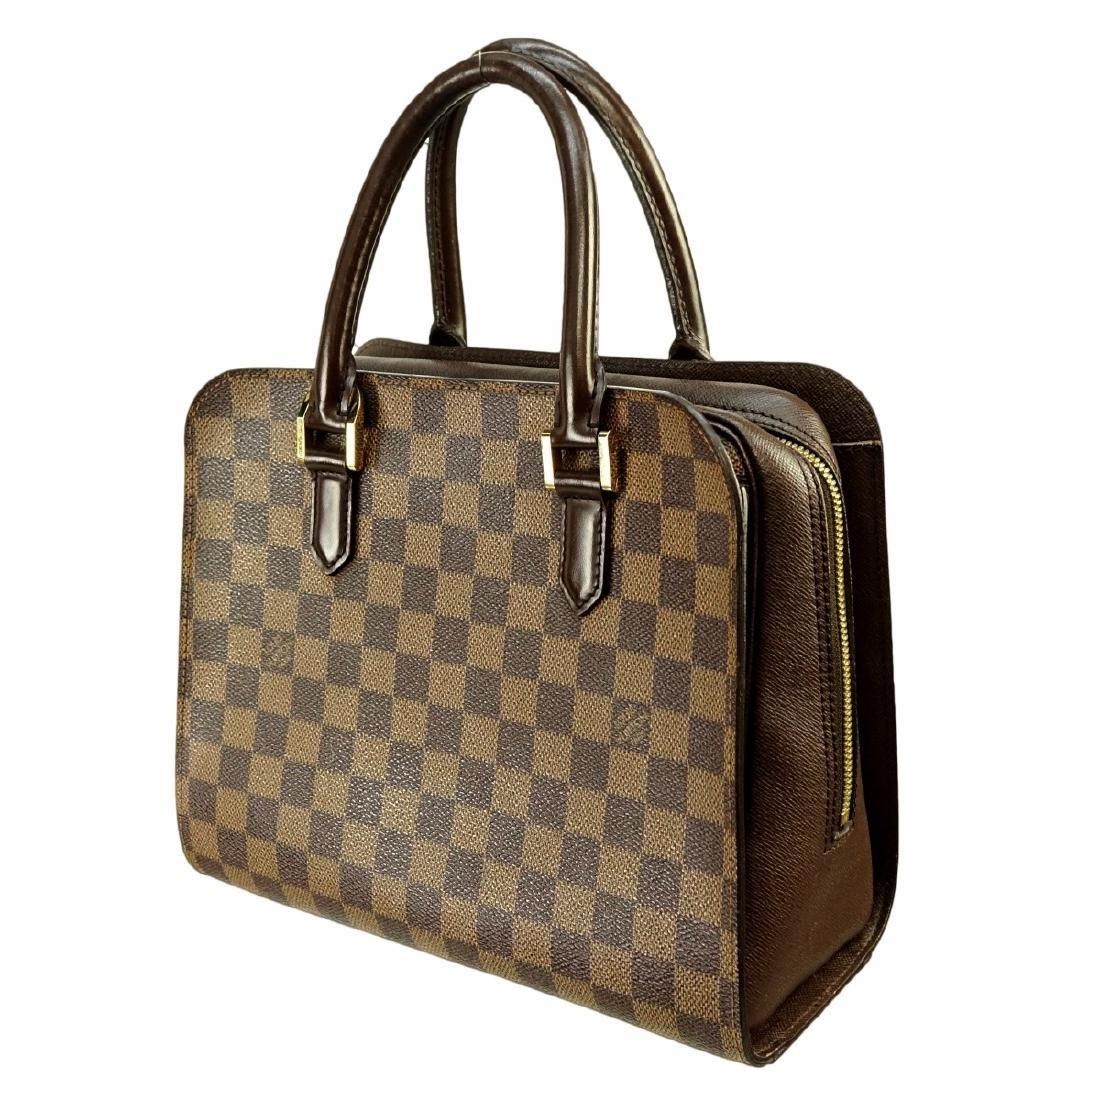 Louis Vuitton Brown Canvas Damier Ebene Triana Bag